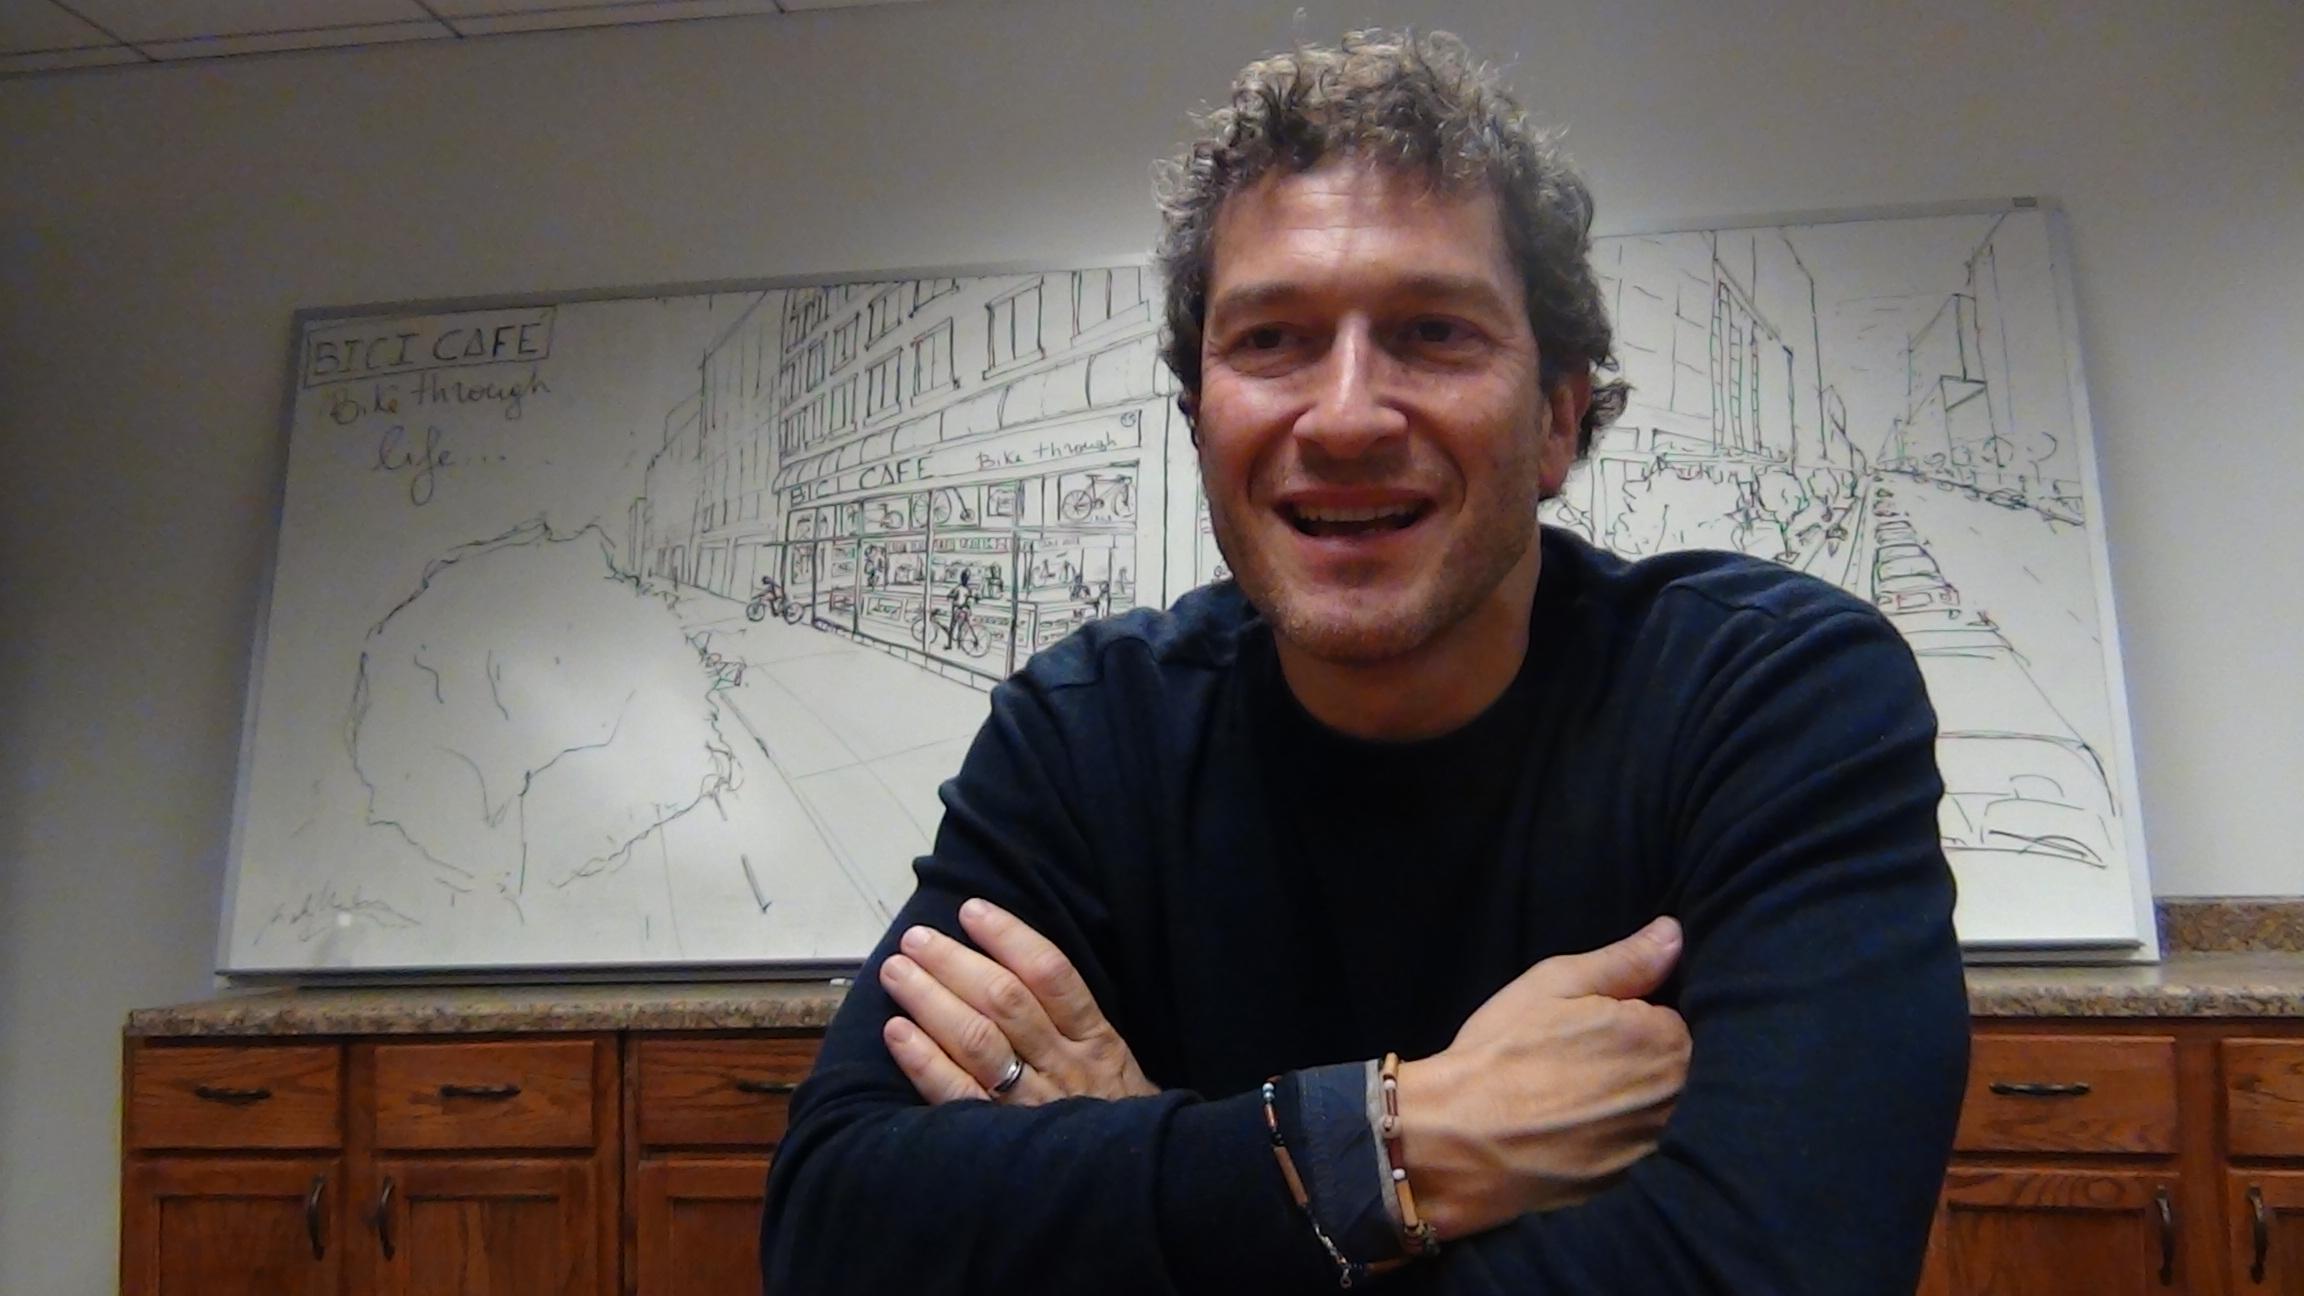 Marco Marinucci